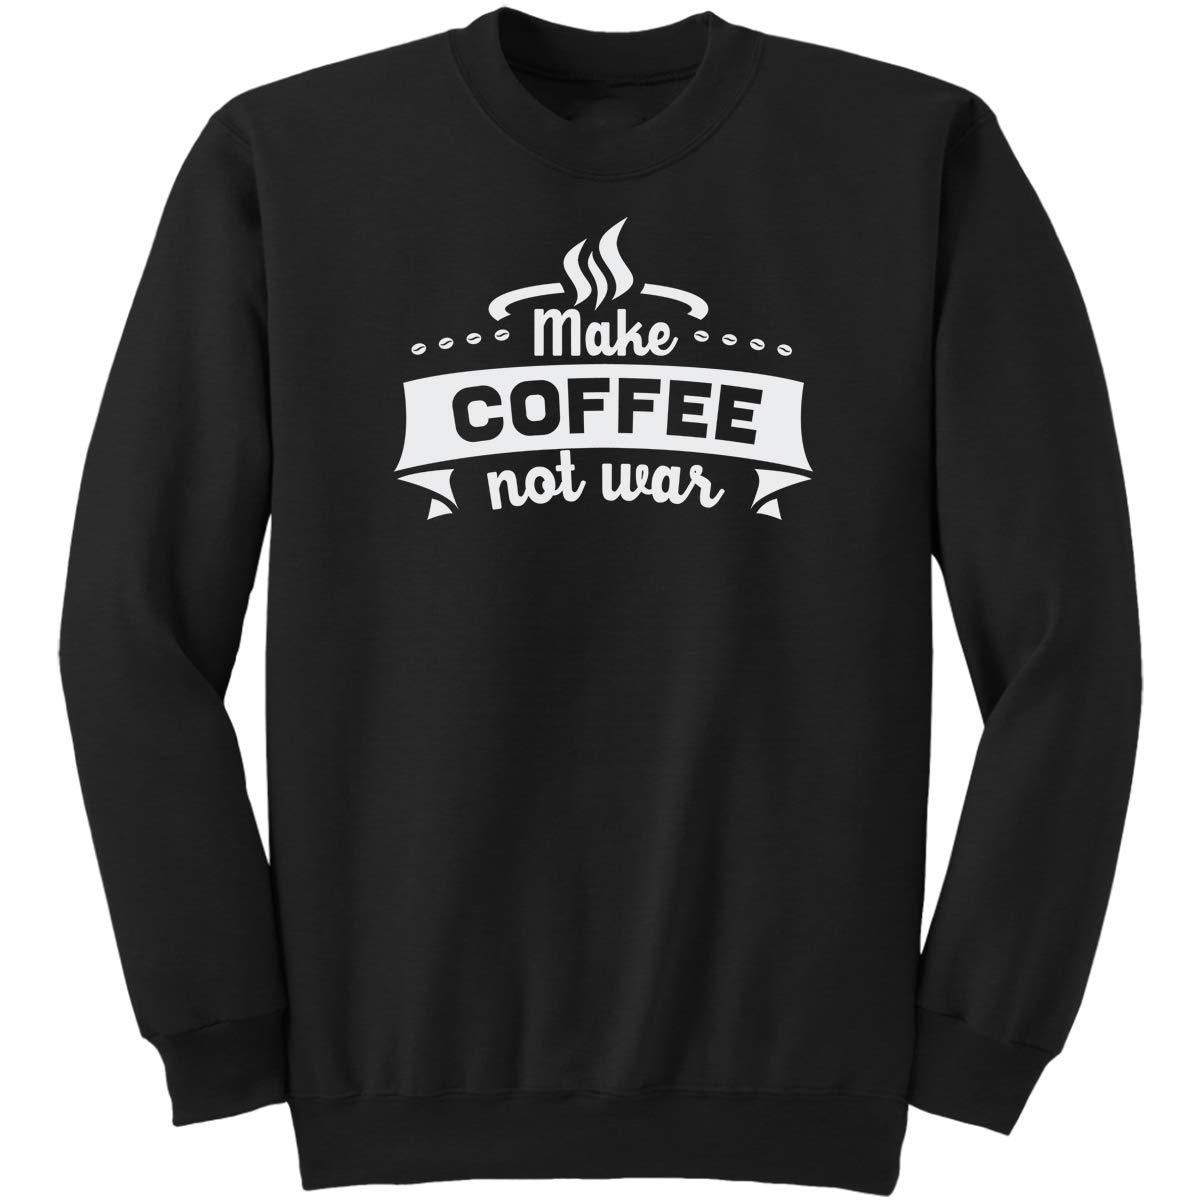 Make Coffee Not War Funny Gifts Idea Sweatshirt